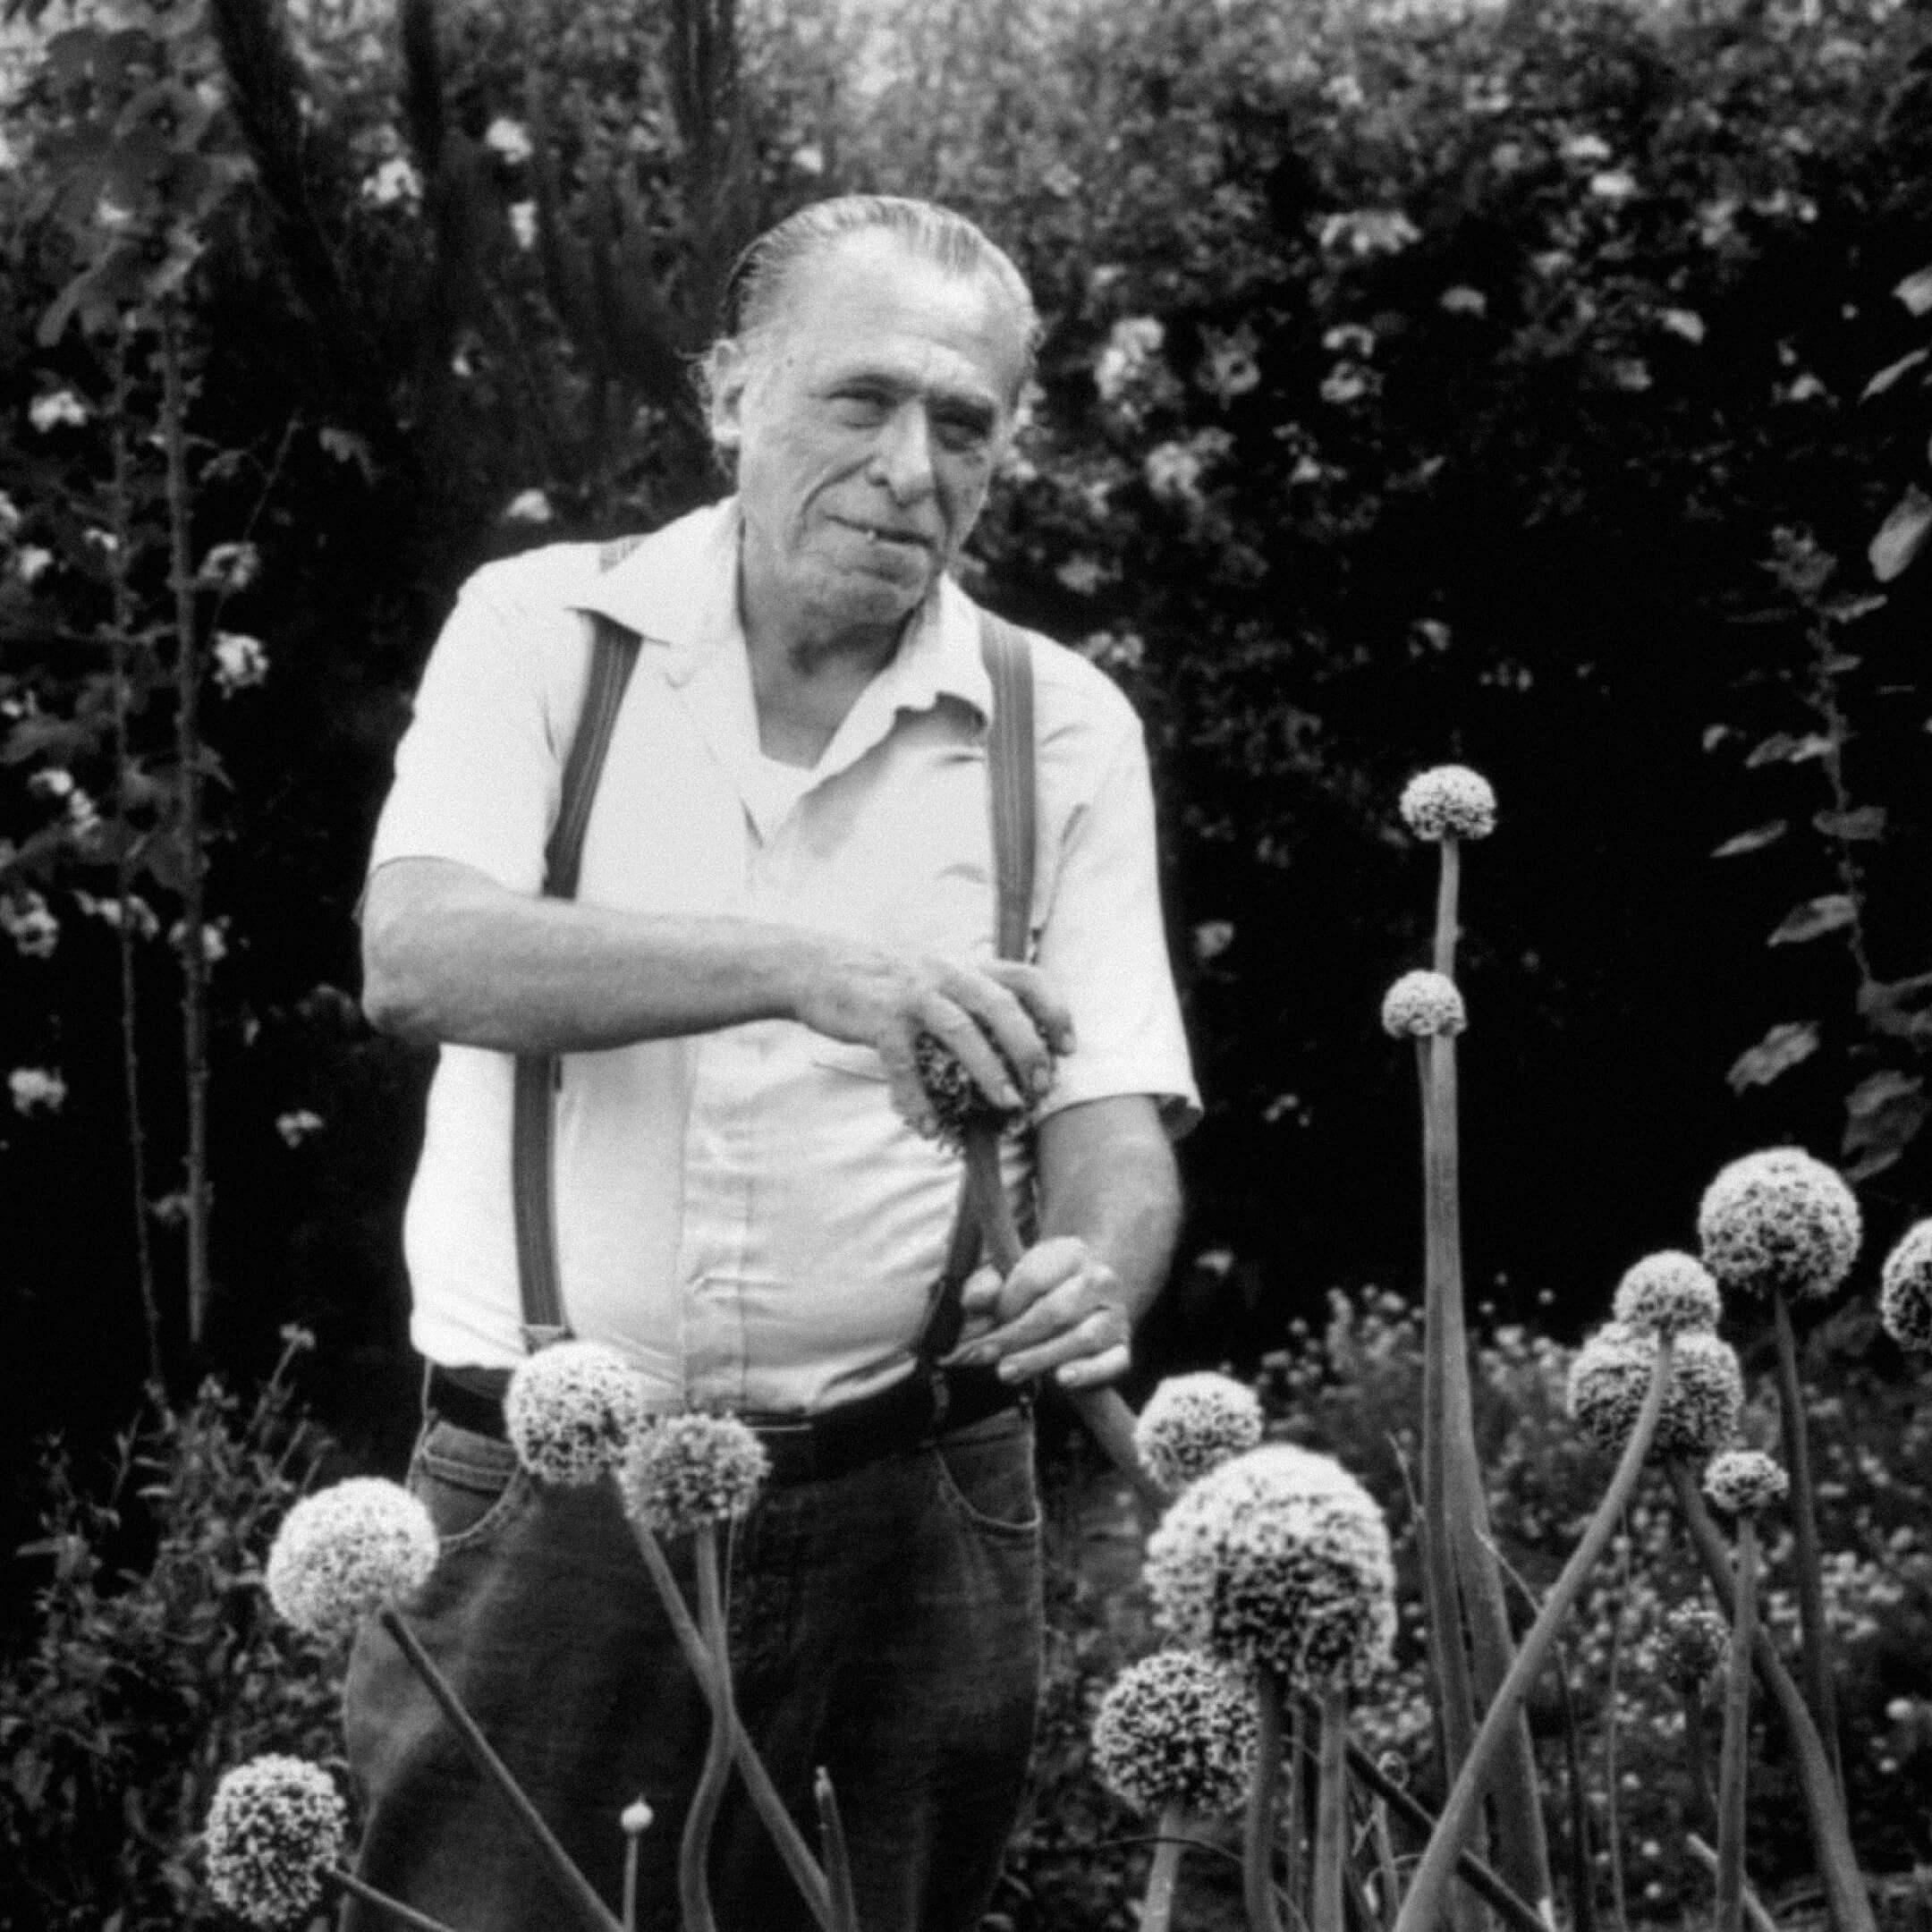 Кадр издокументального фильма «Буковски» (Bukowski: Born into This), режиссер Джон Даллаган, 2003